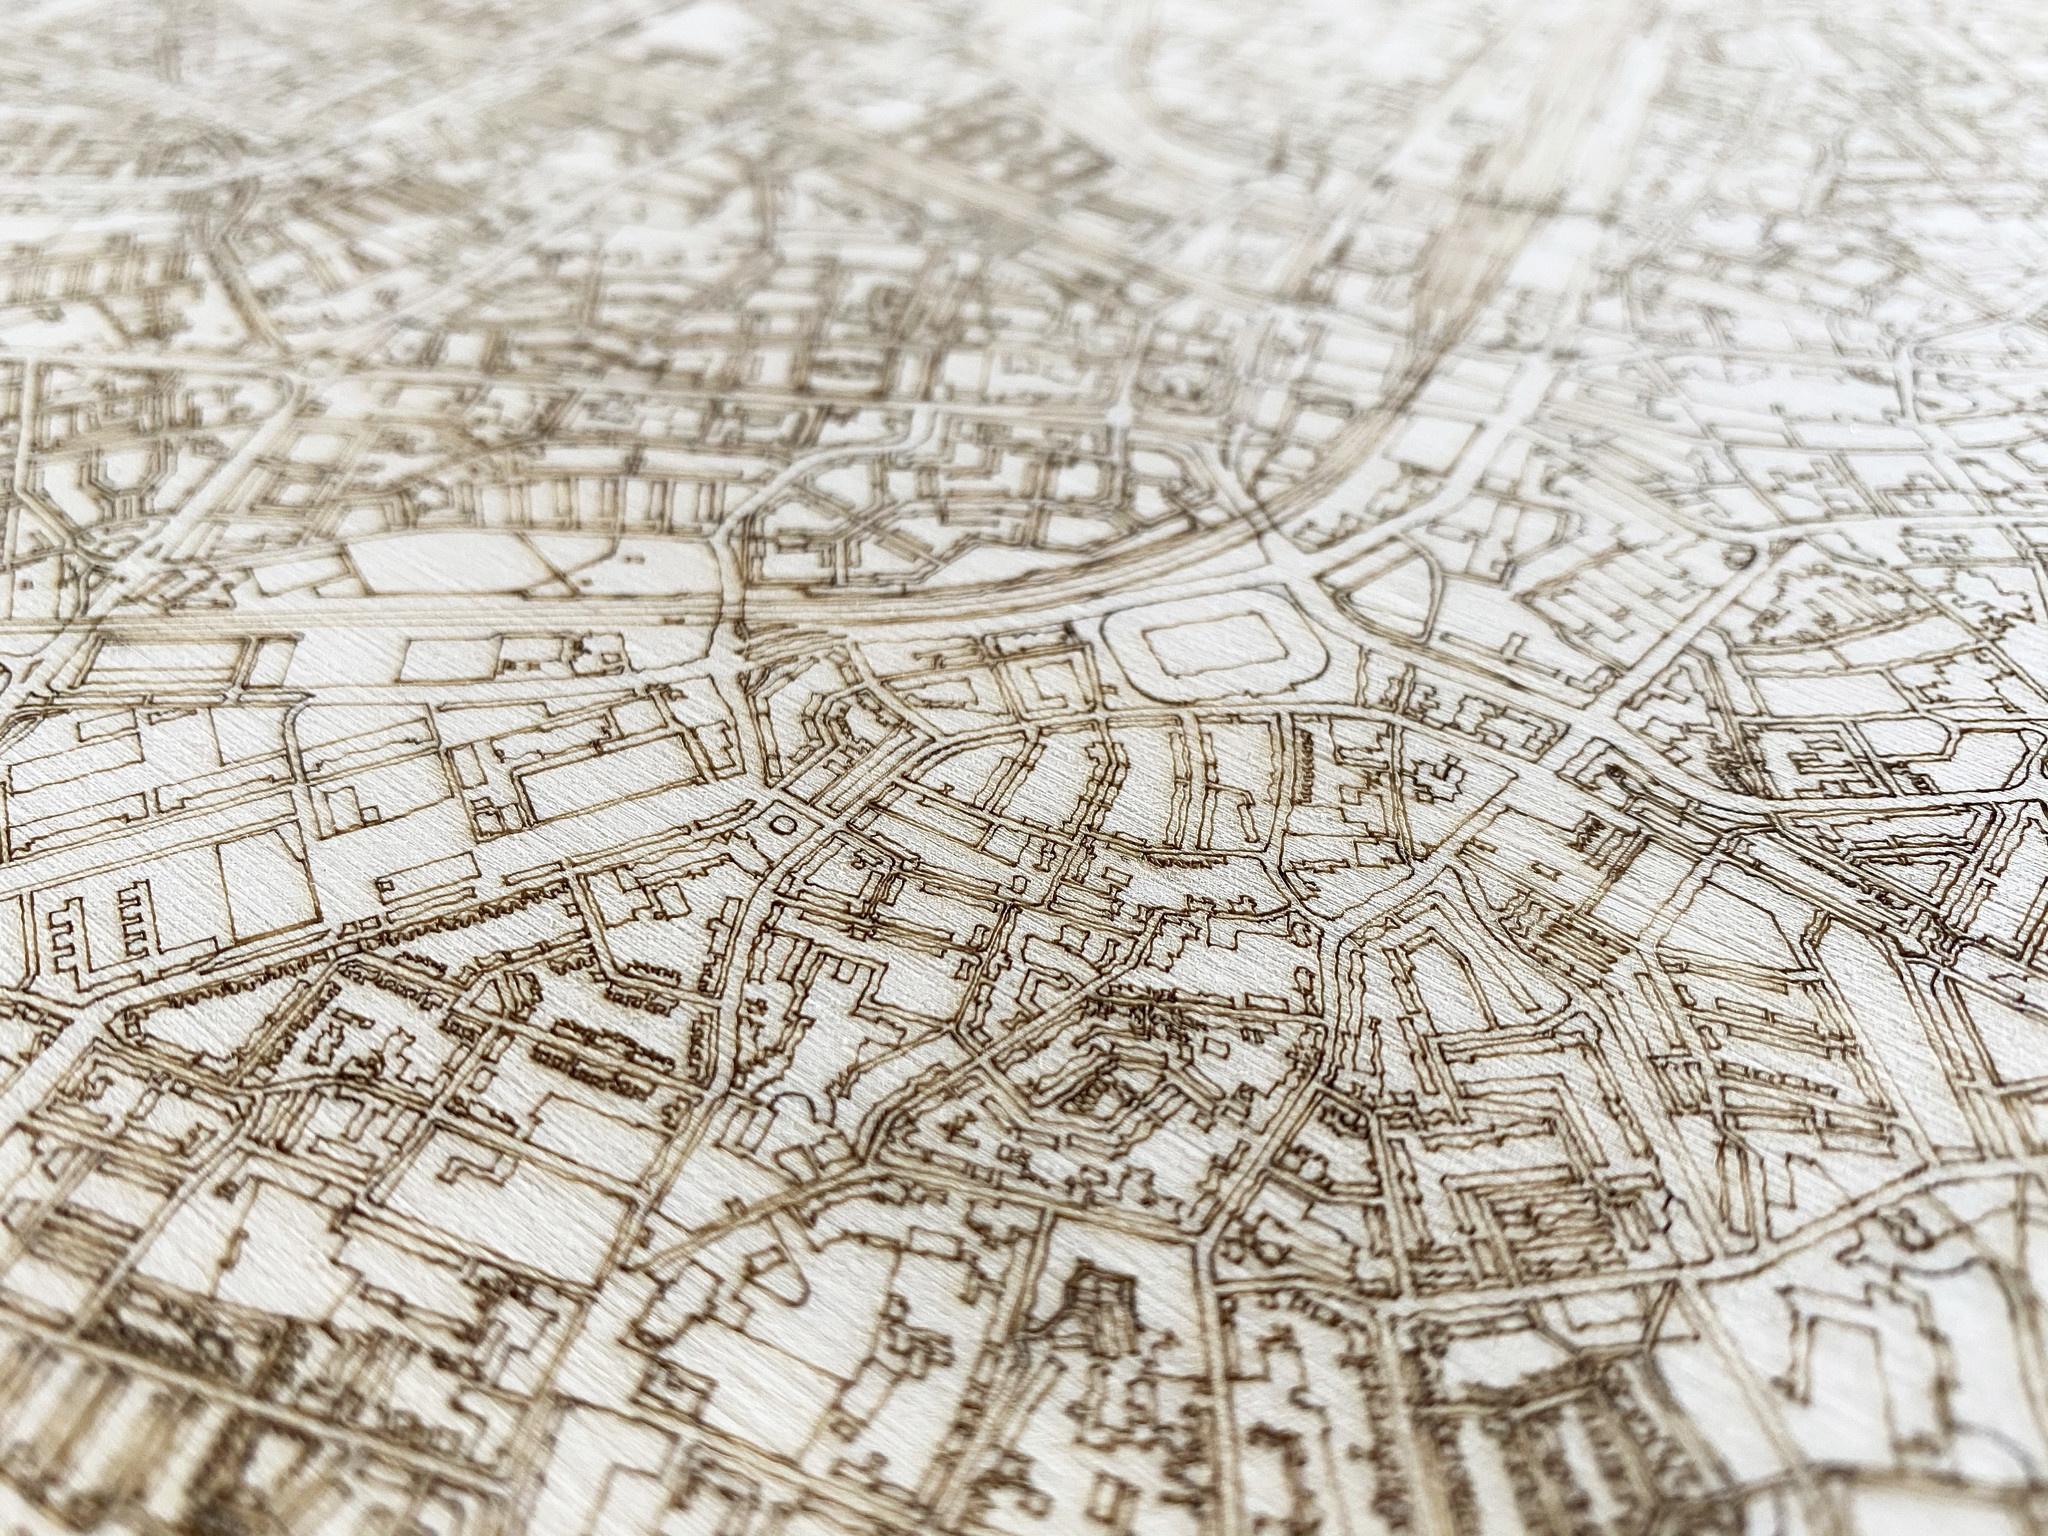 Citymap Houten | houten wanddecoratie-3